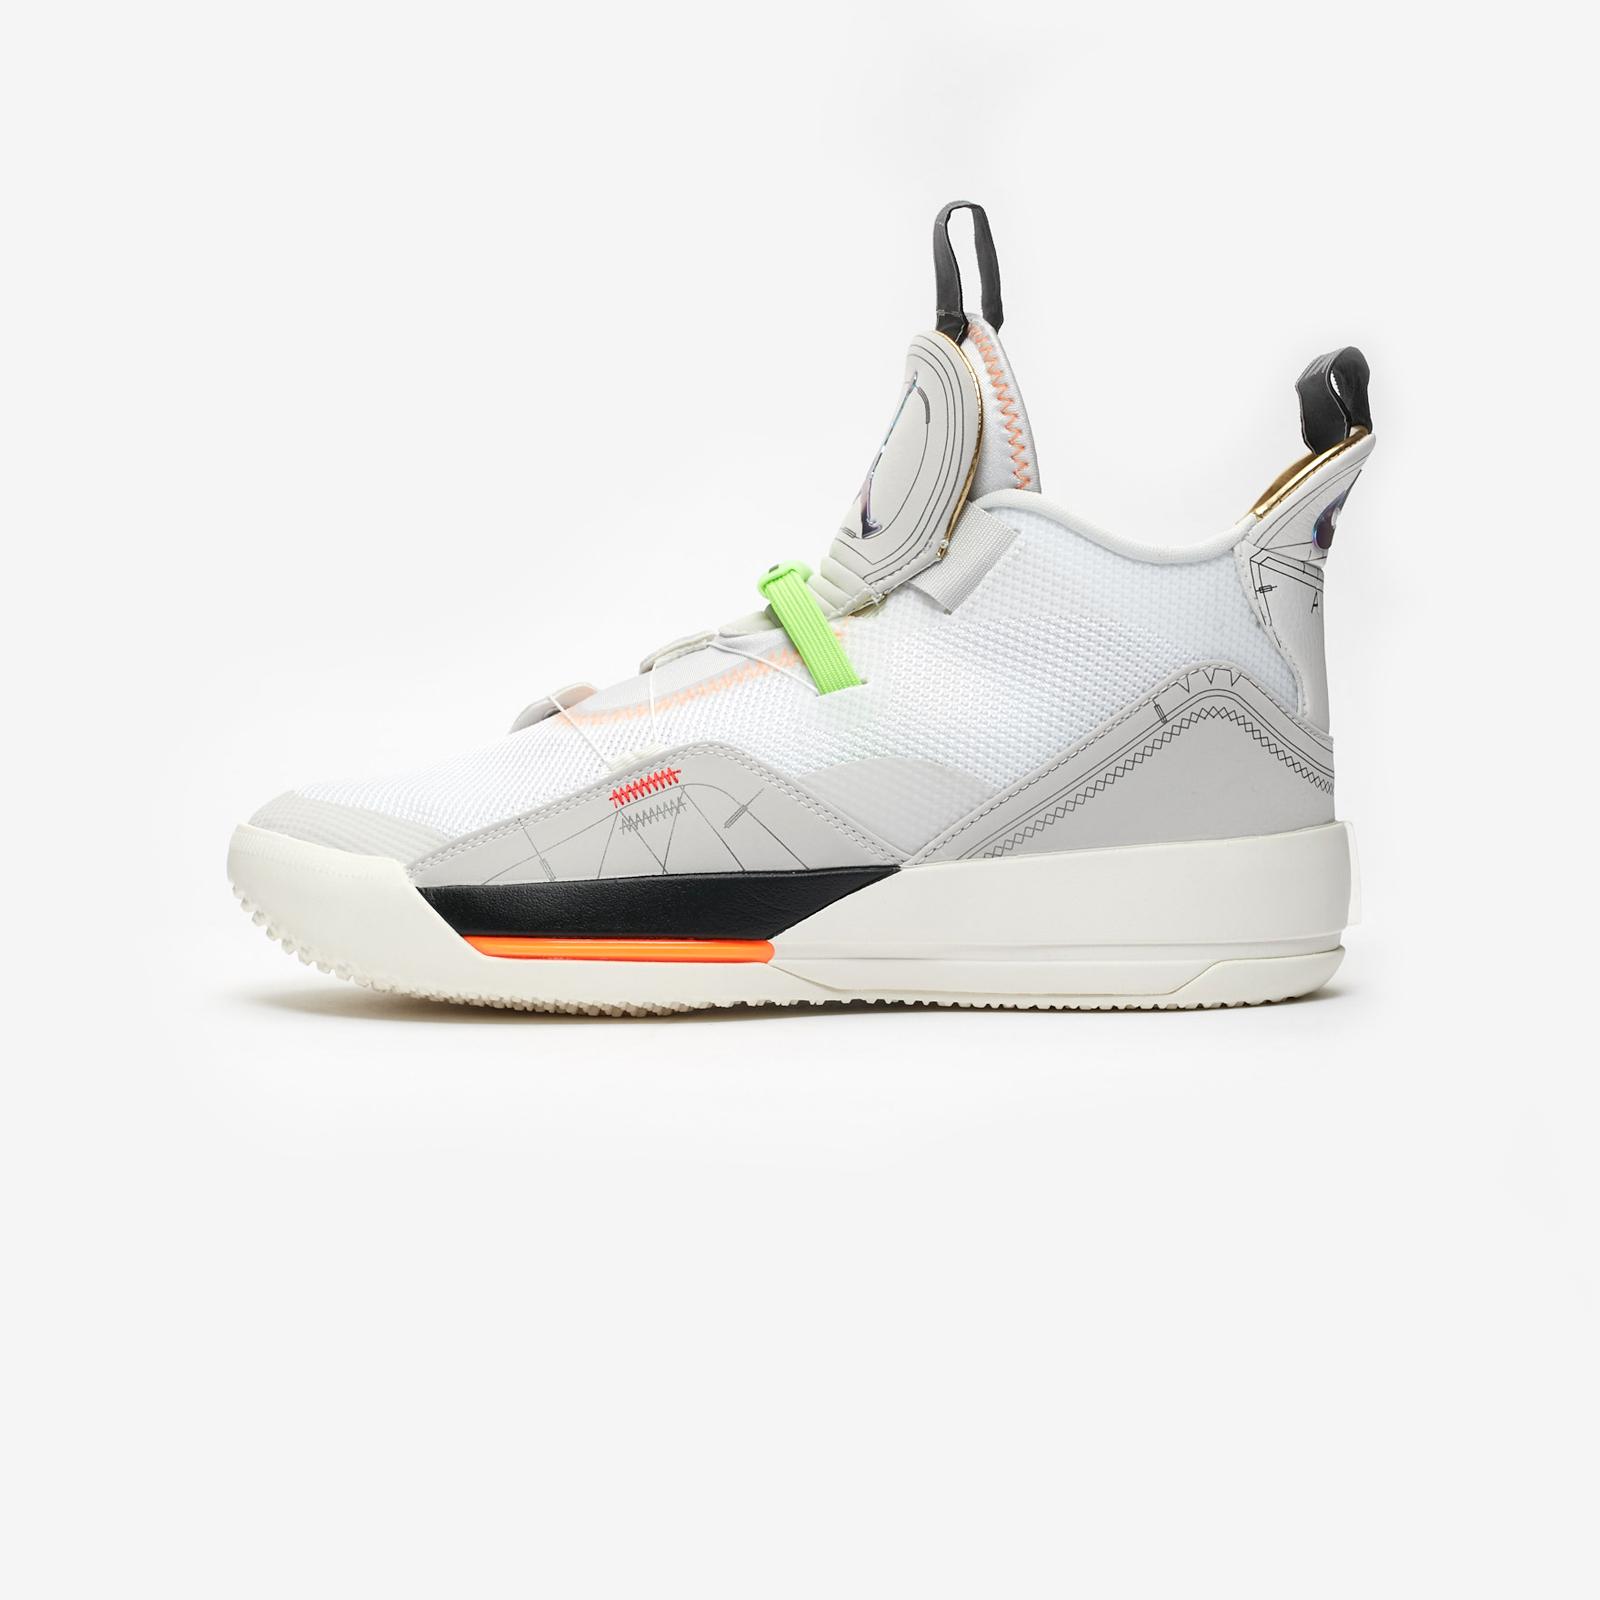 0195583c4f816 Jordan Brand Air Jordan XXXIII - Aq8830-004 - Sneakersnstuff | sneakers &  streetwear online since 1999